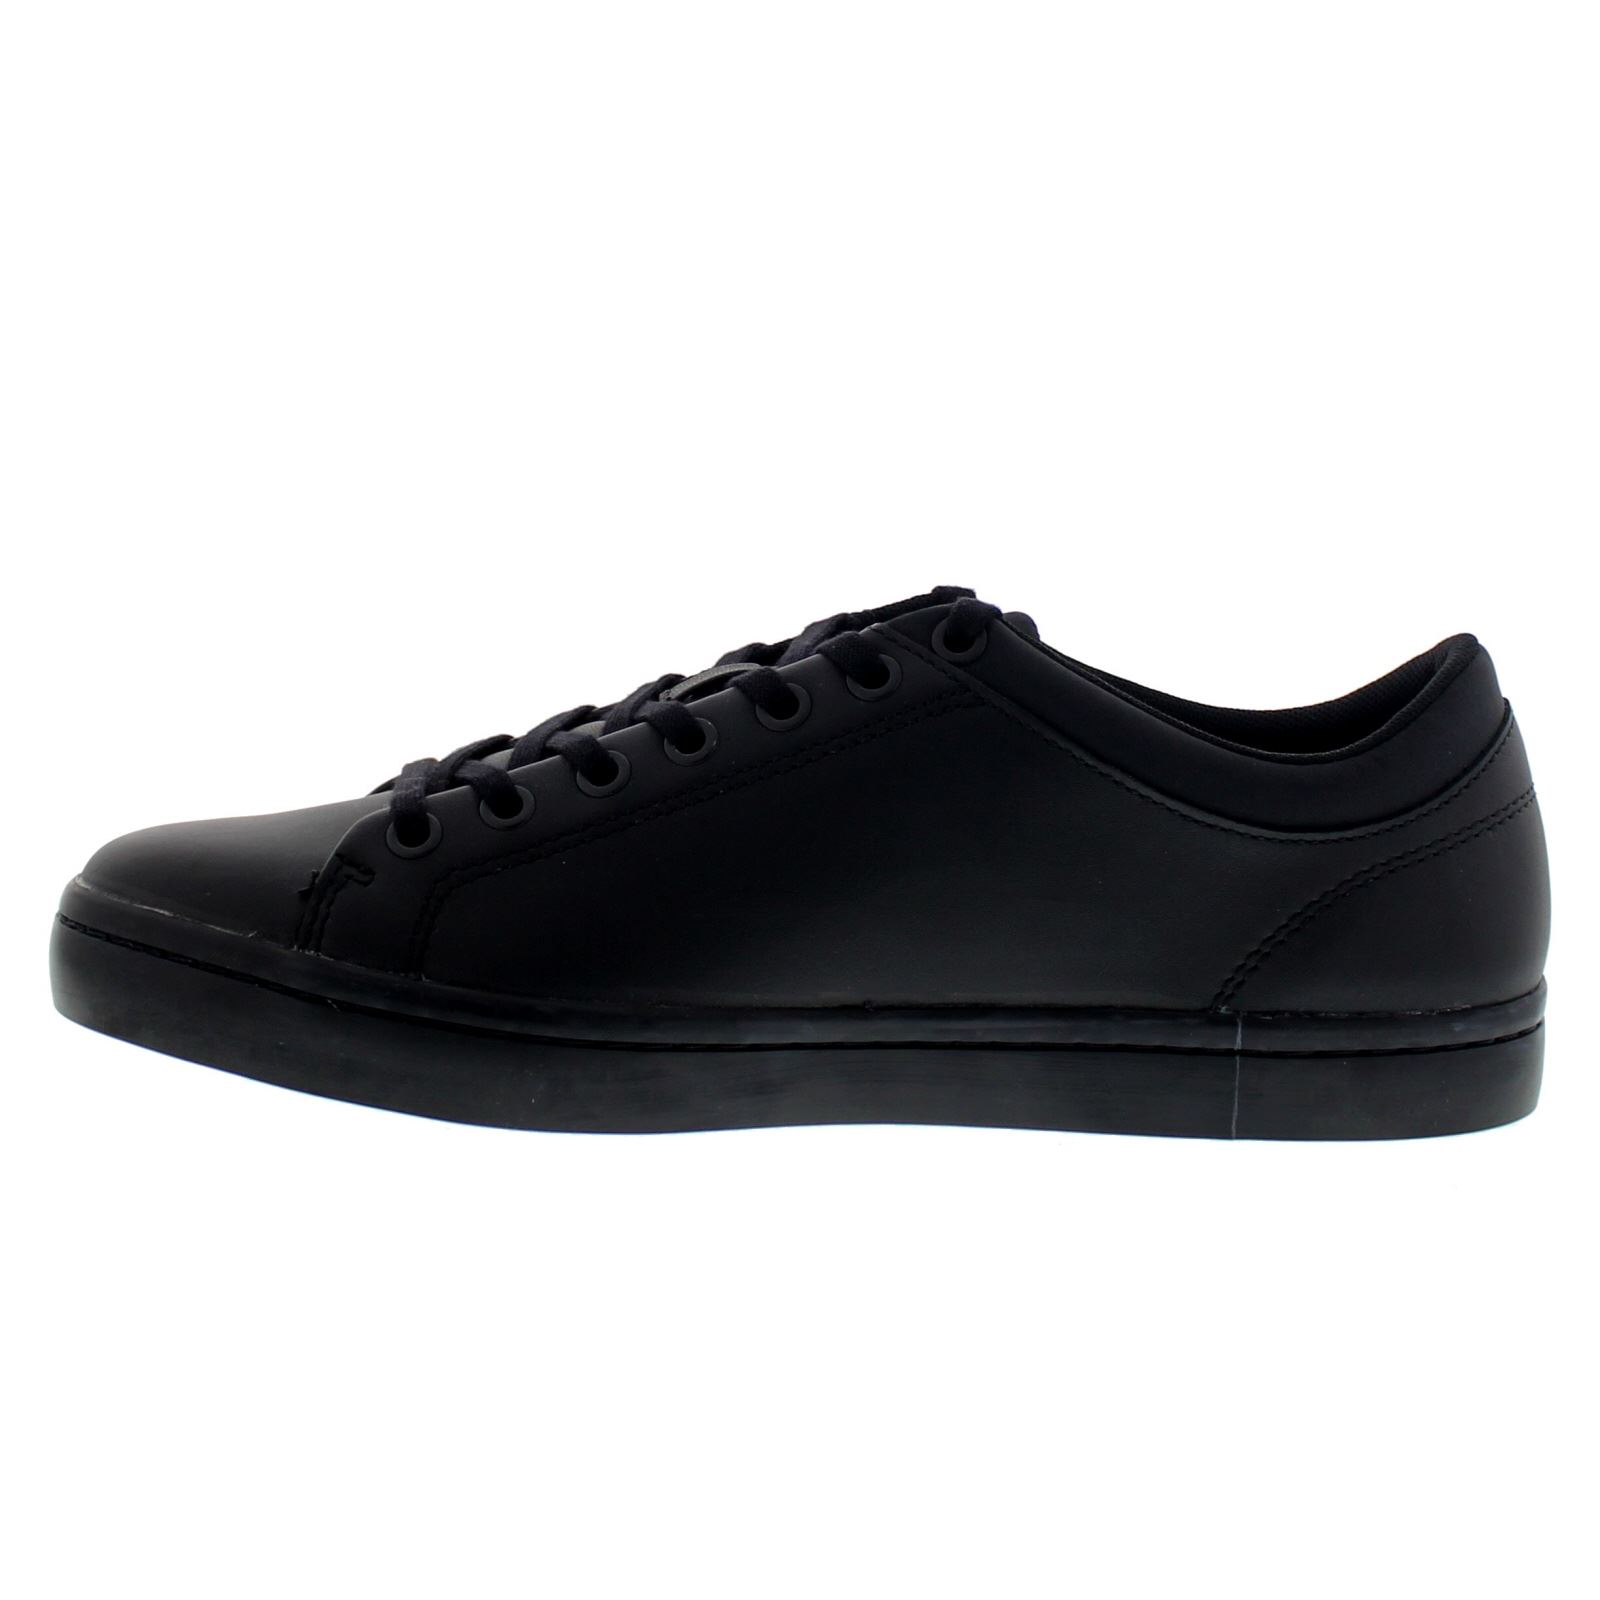 Lacoste Straightset SPT 316 1 SPM Black Mens Shoes